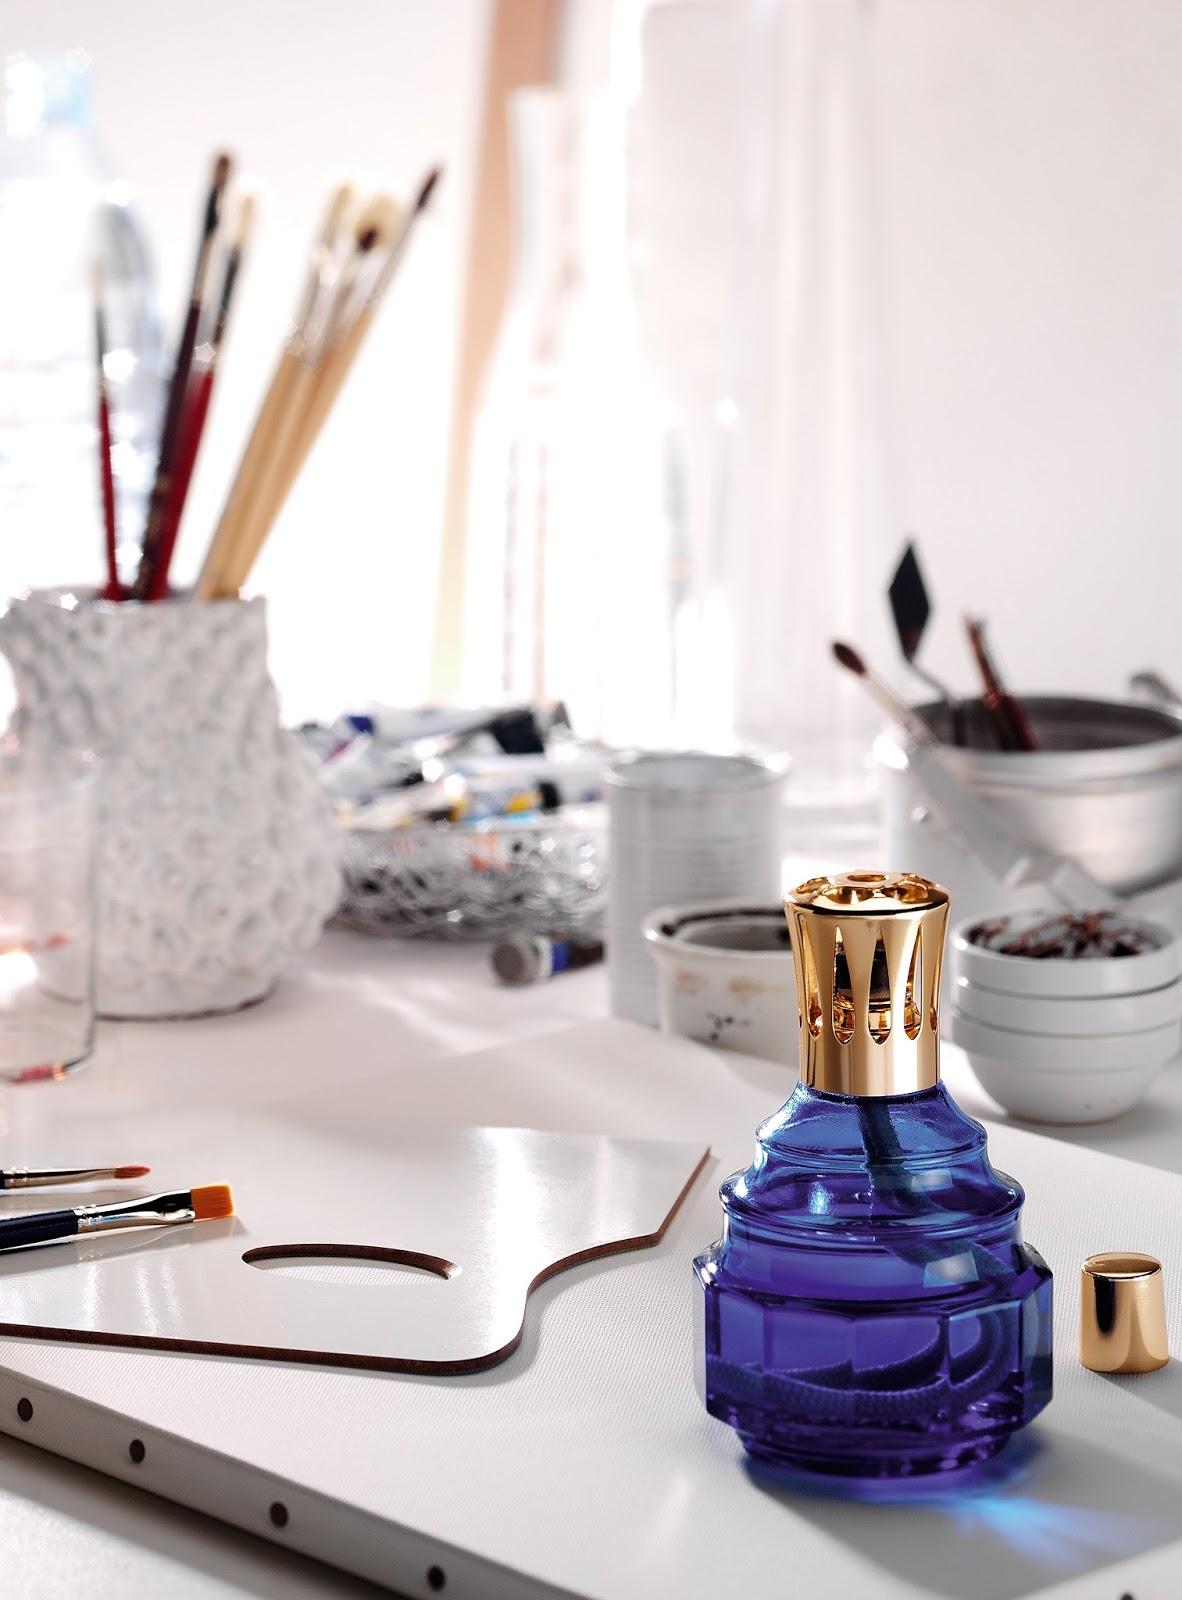 lampe berger paris niesamowita zapachowa lampa to co kobieta lubi najbardziej. Black Bedroom Furniture Sets. Home Design Ideas